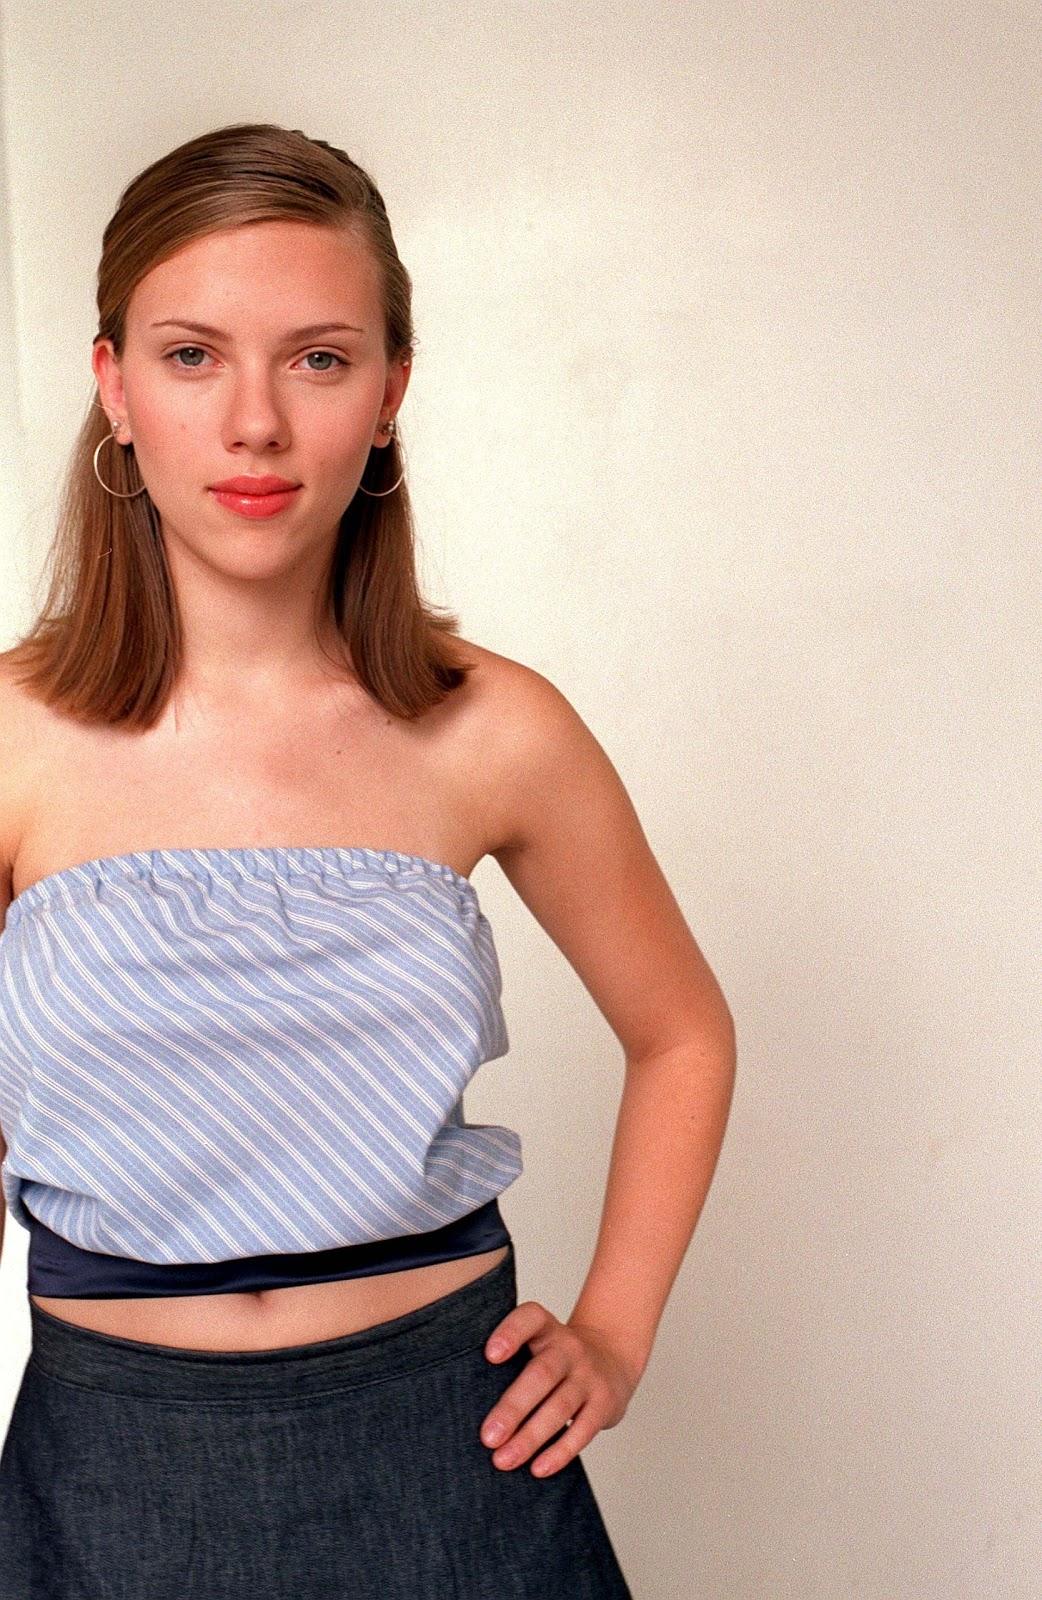 Scarlett johansson pictures gallery 8 film actresses - Scarlett johansson blogspot ...